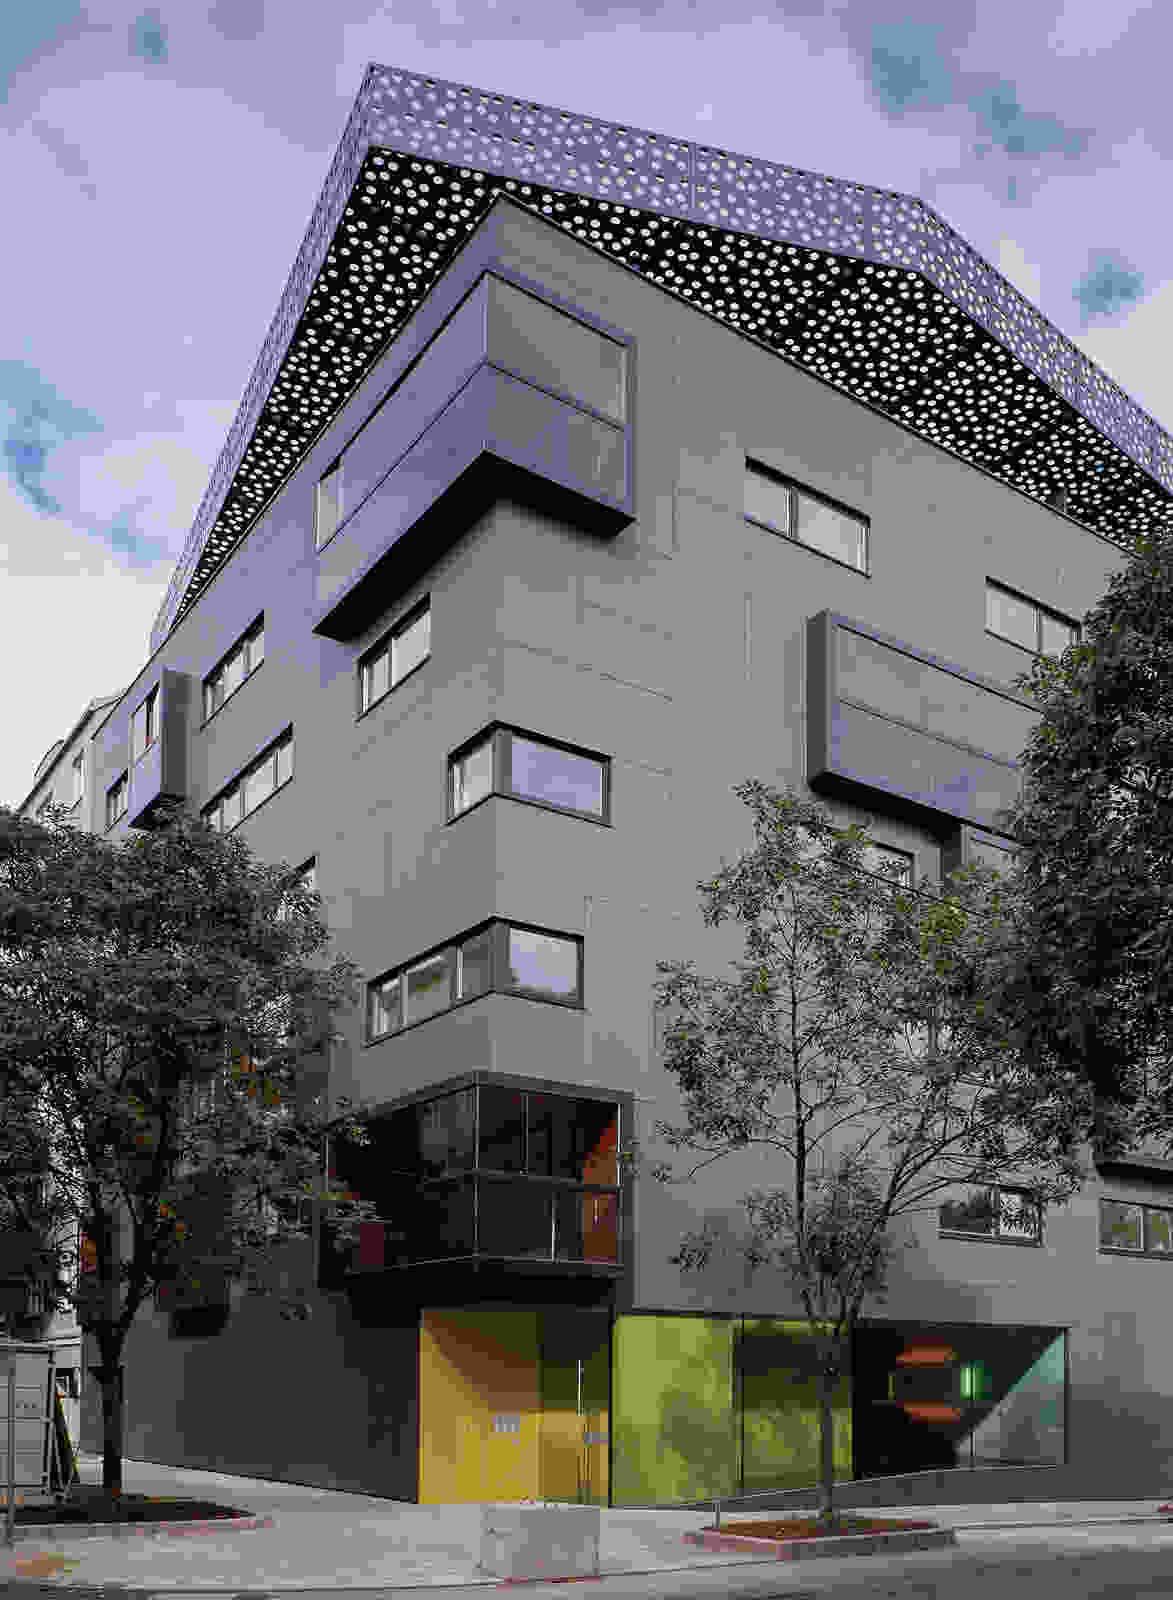 052 Paltramplatz Margherita Spiluttini 004 facade